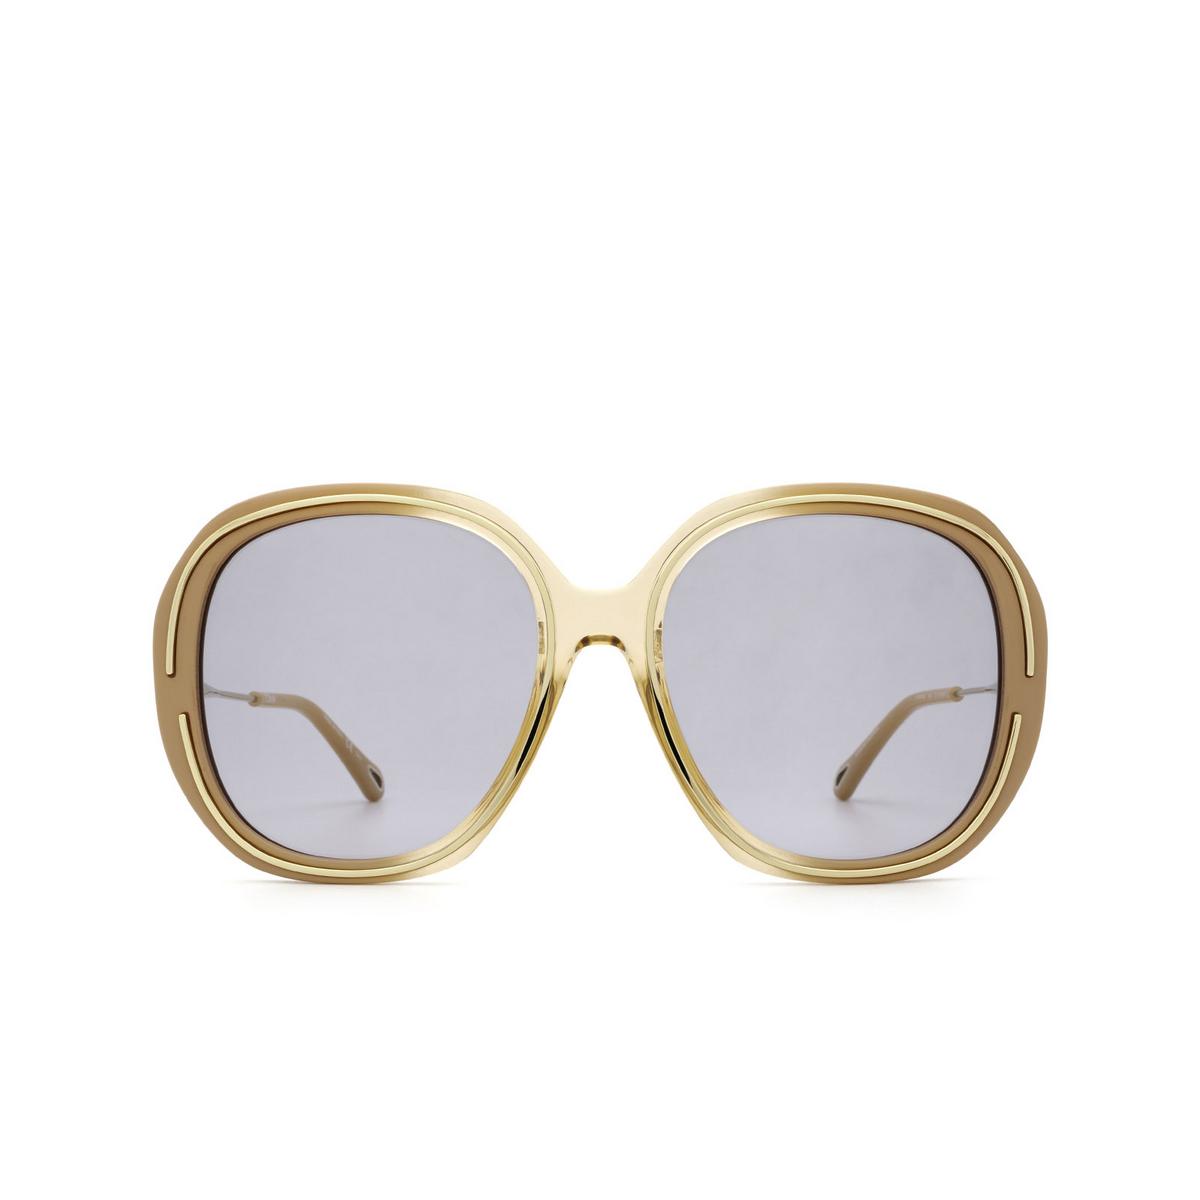 Chloé® Square Sunglasses: CH0078SA color Nude 002 - front view.